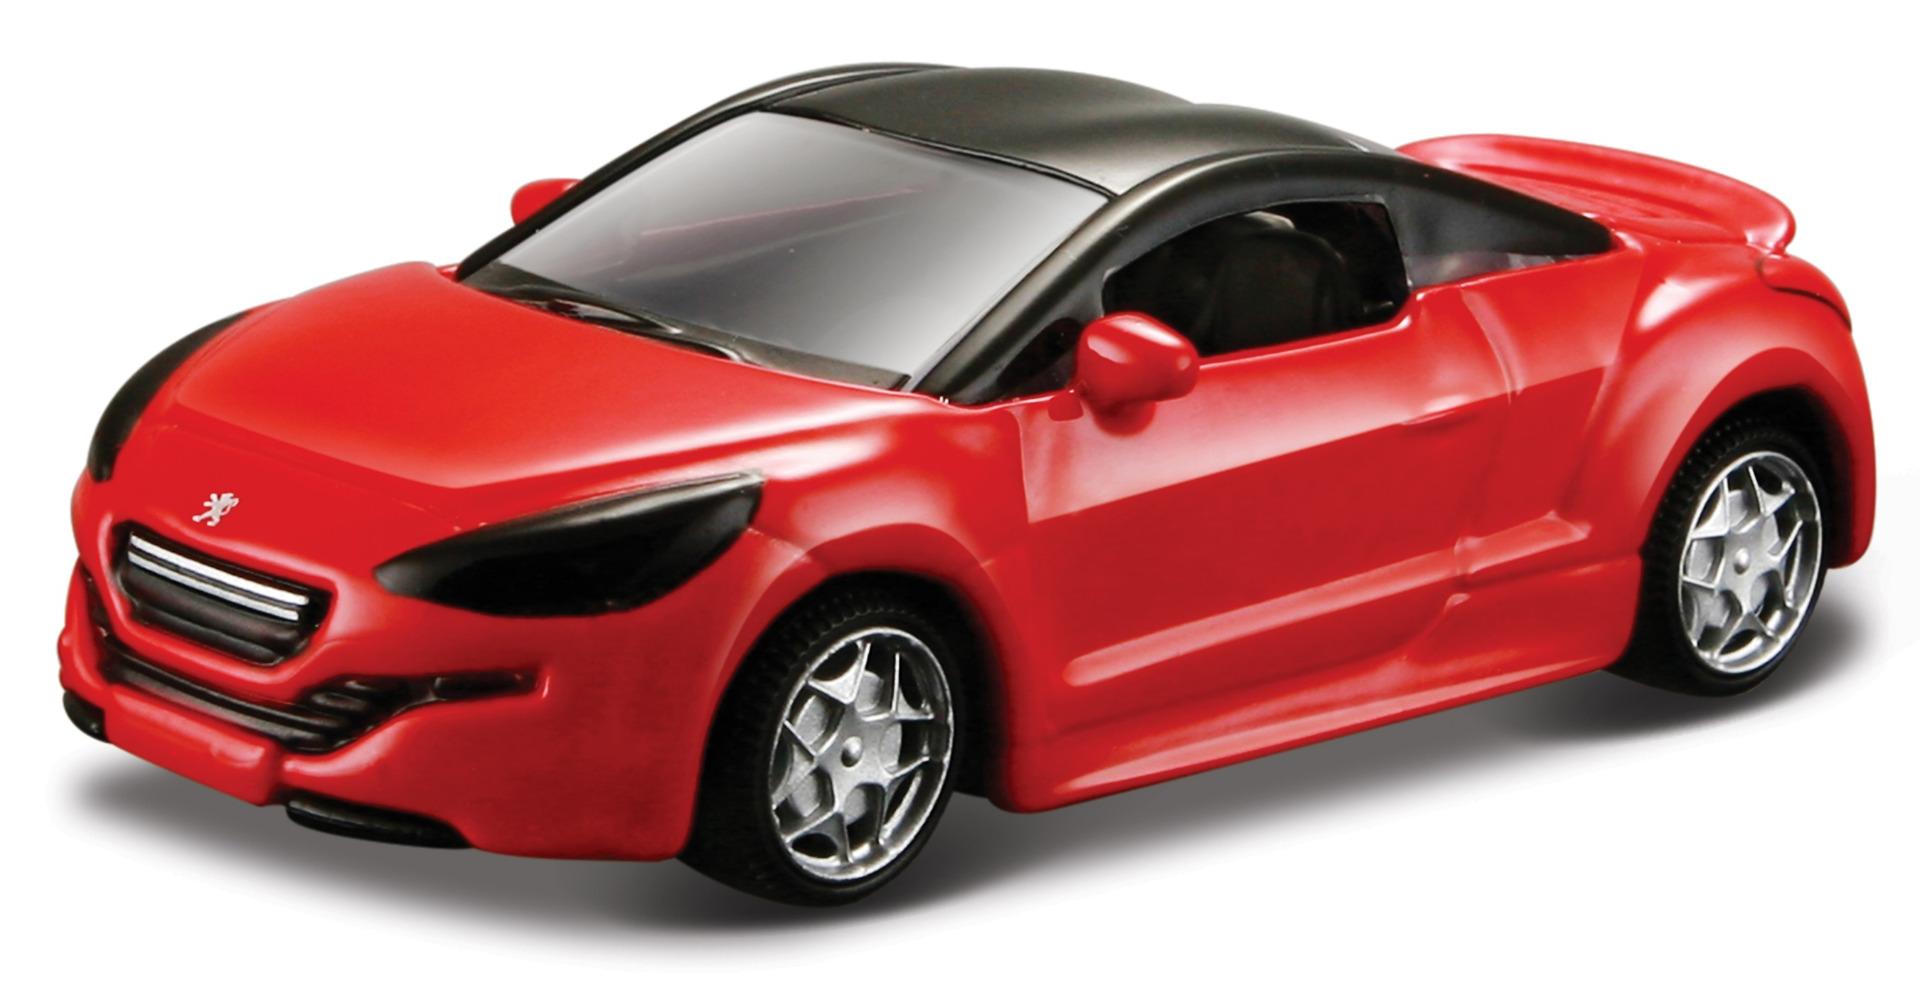 Peugeot 308 RCZ Scale1:64 (Red/Vermelho)